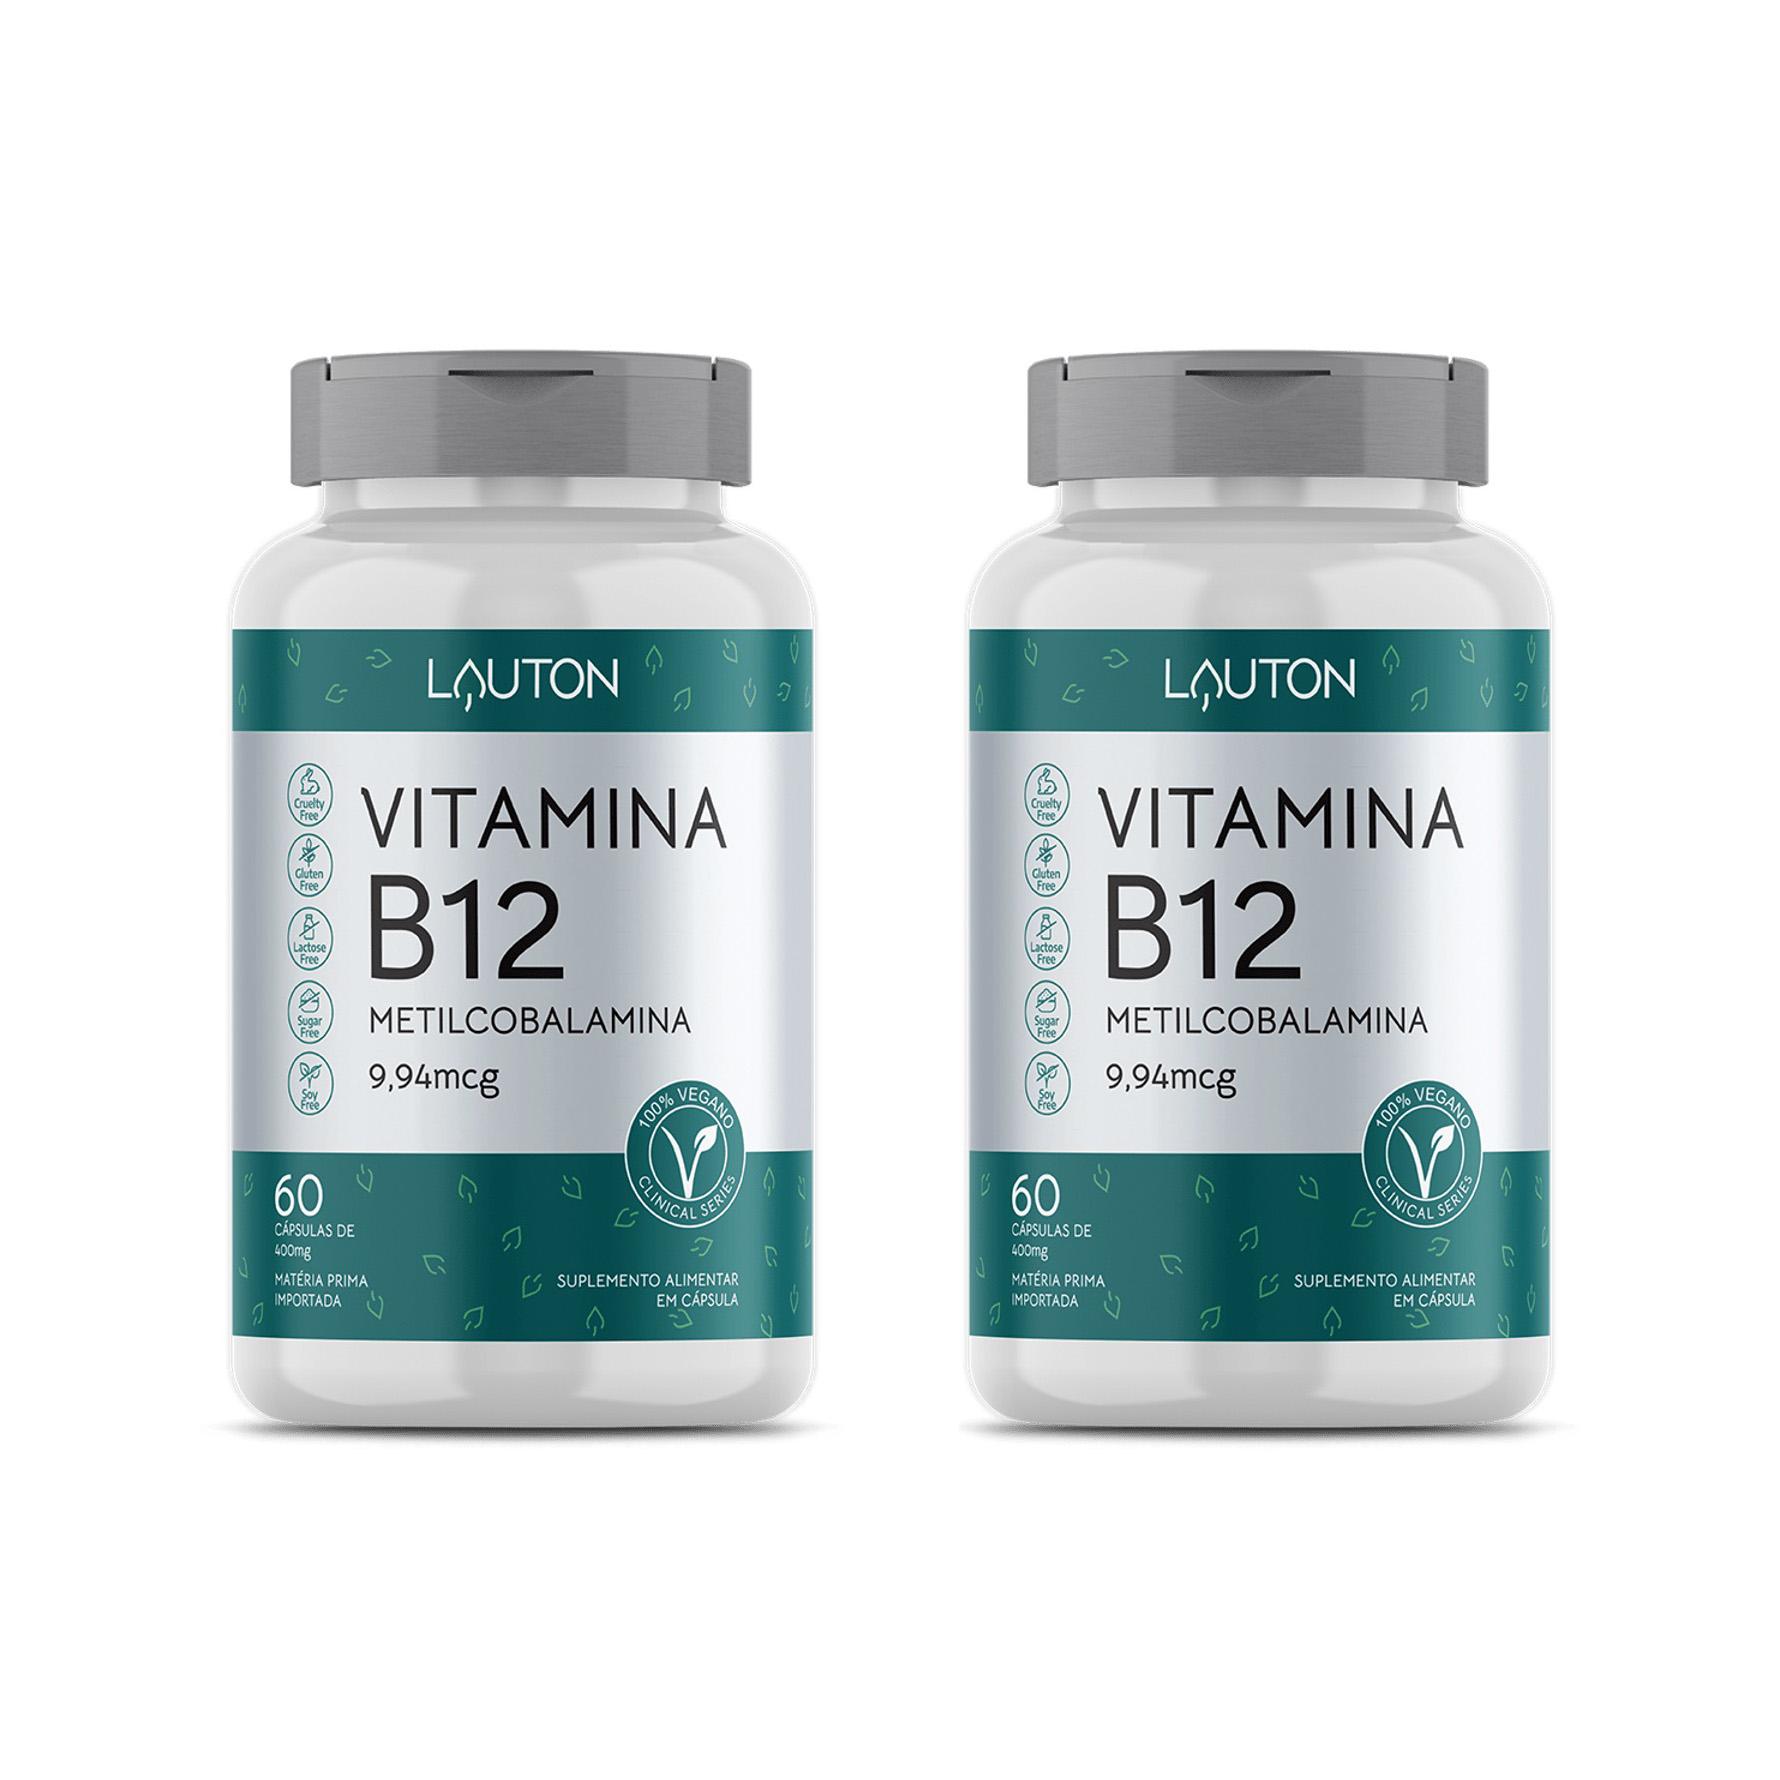 Vitamina B12 9,94mcg - 60 Cápsulas - Lauton Nutrition (2 Unidades)